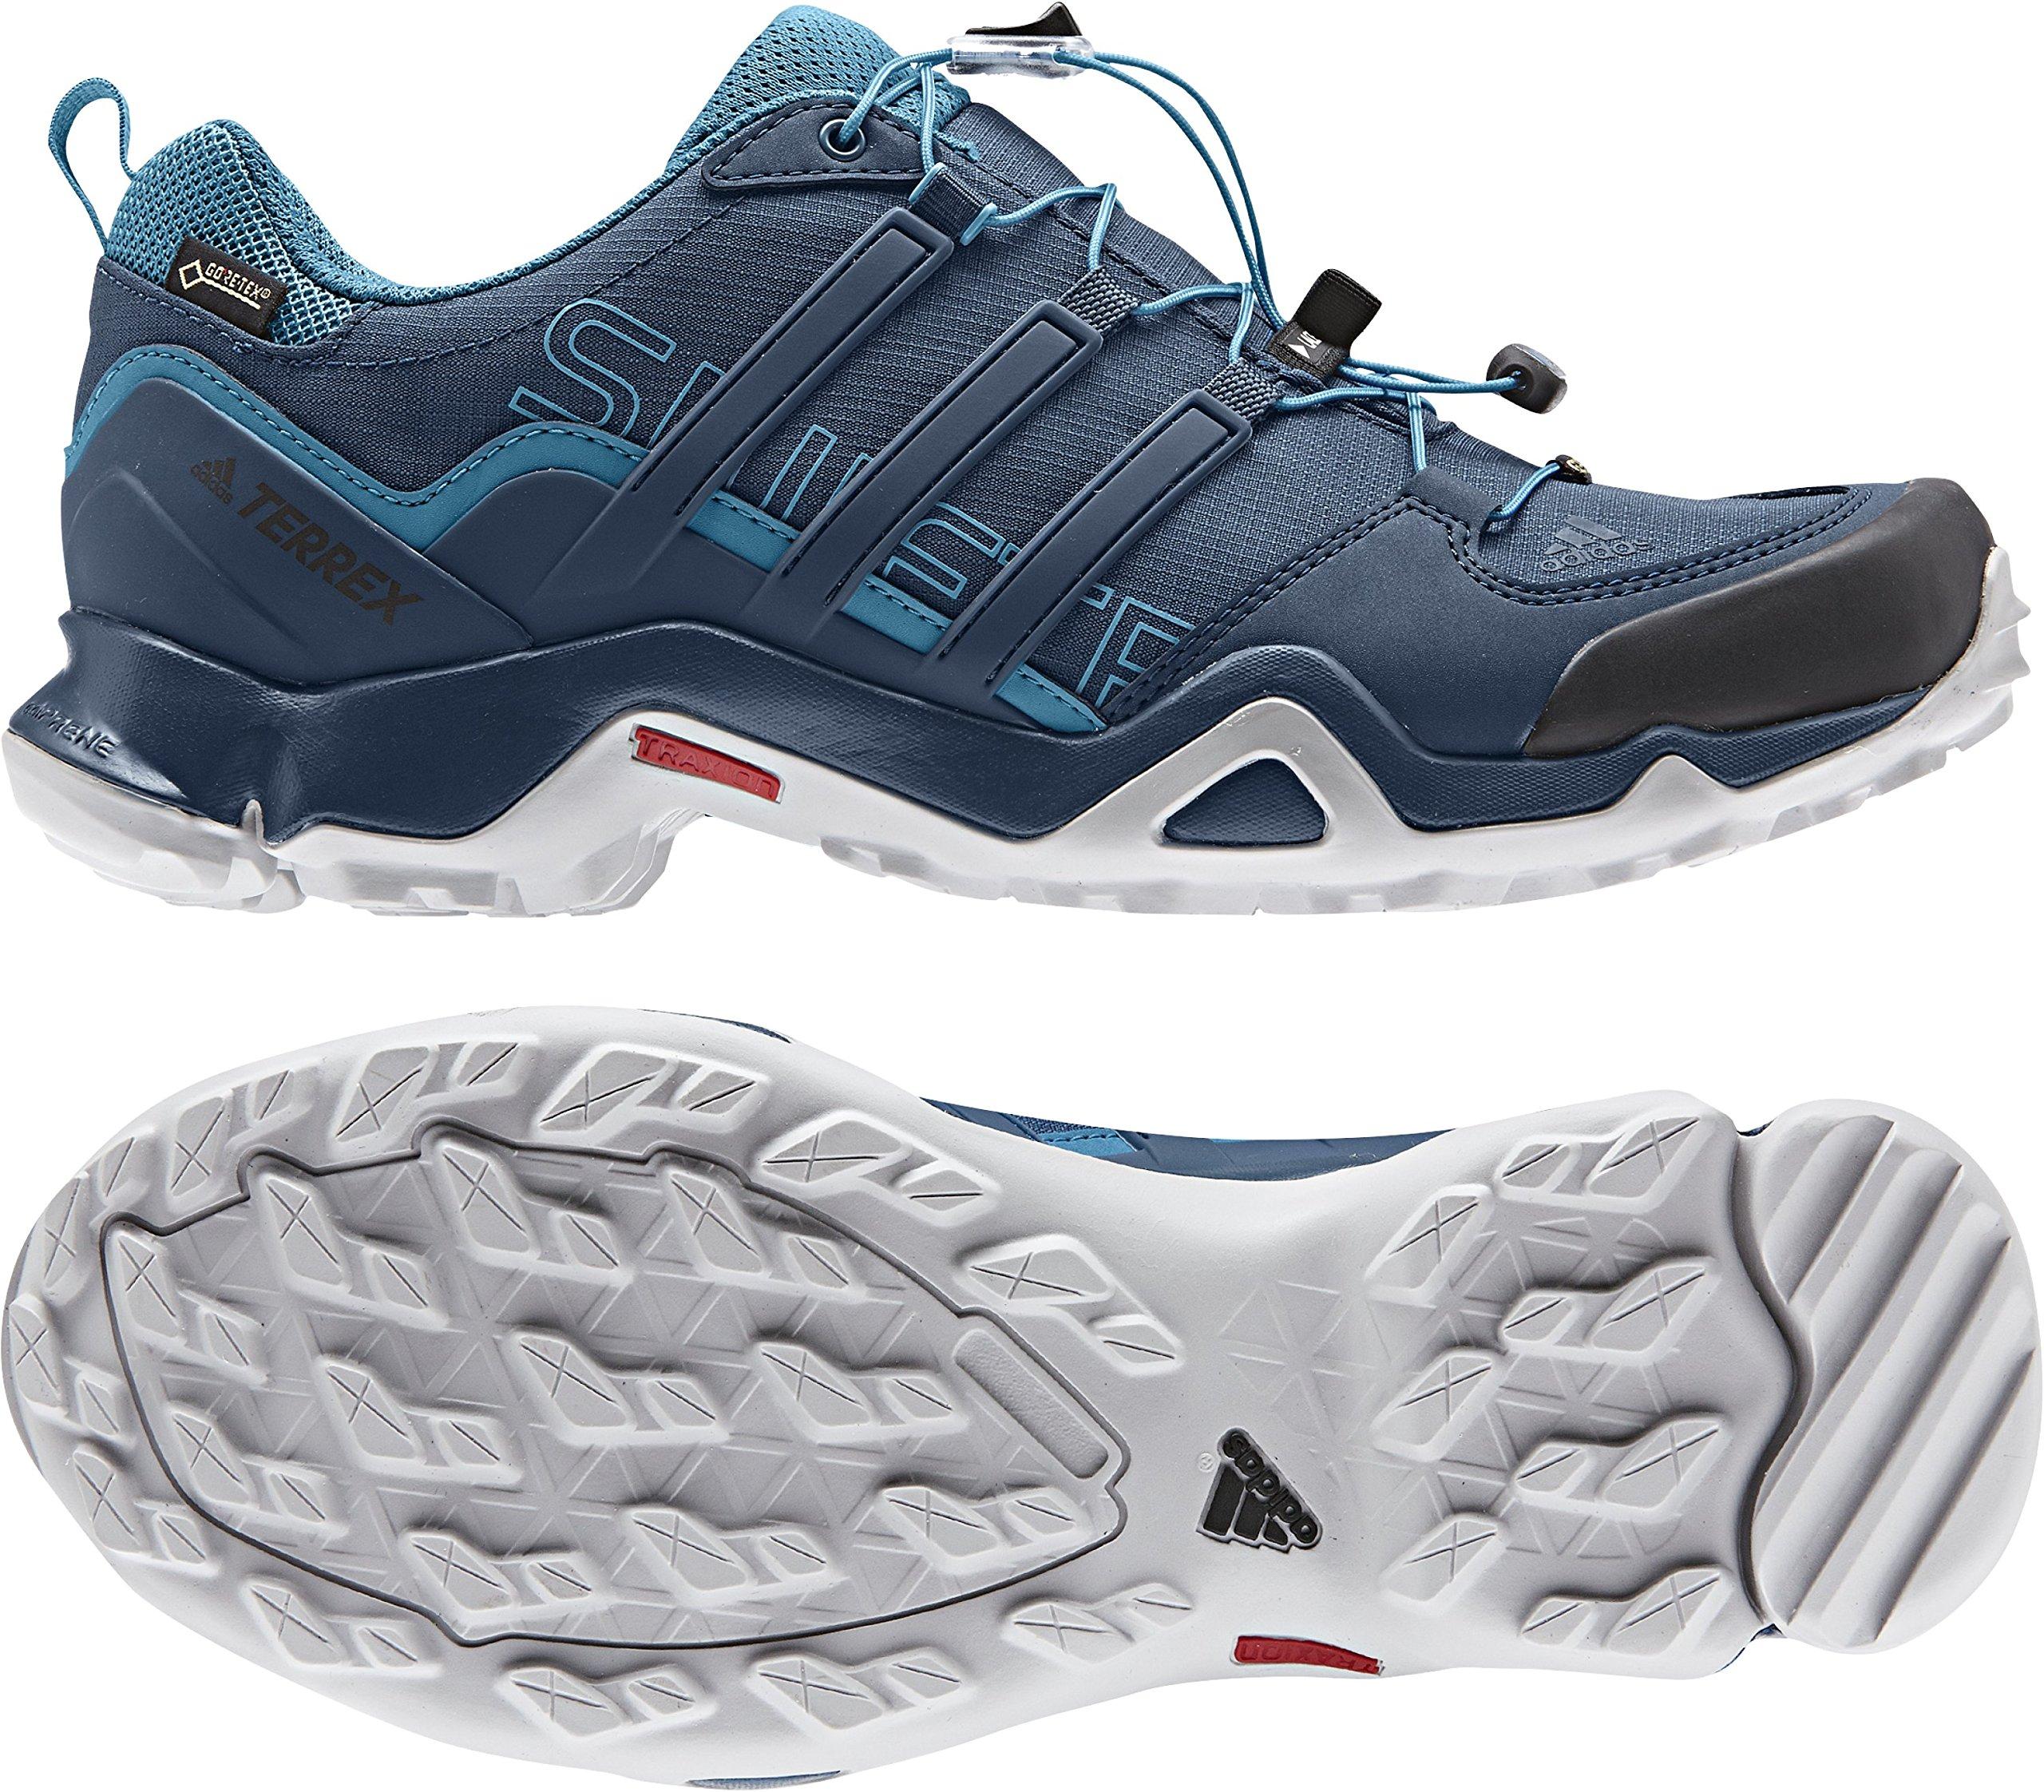 adidas outdoor Men's Terrex Swift R GTX Blue Night/Blue Night/Mystery Petrol Hiking Shoes - 10 D(M) US